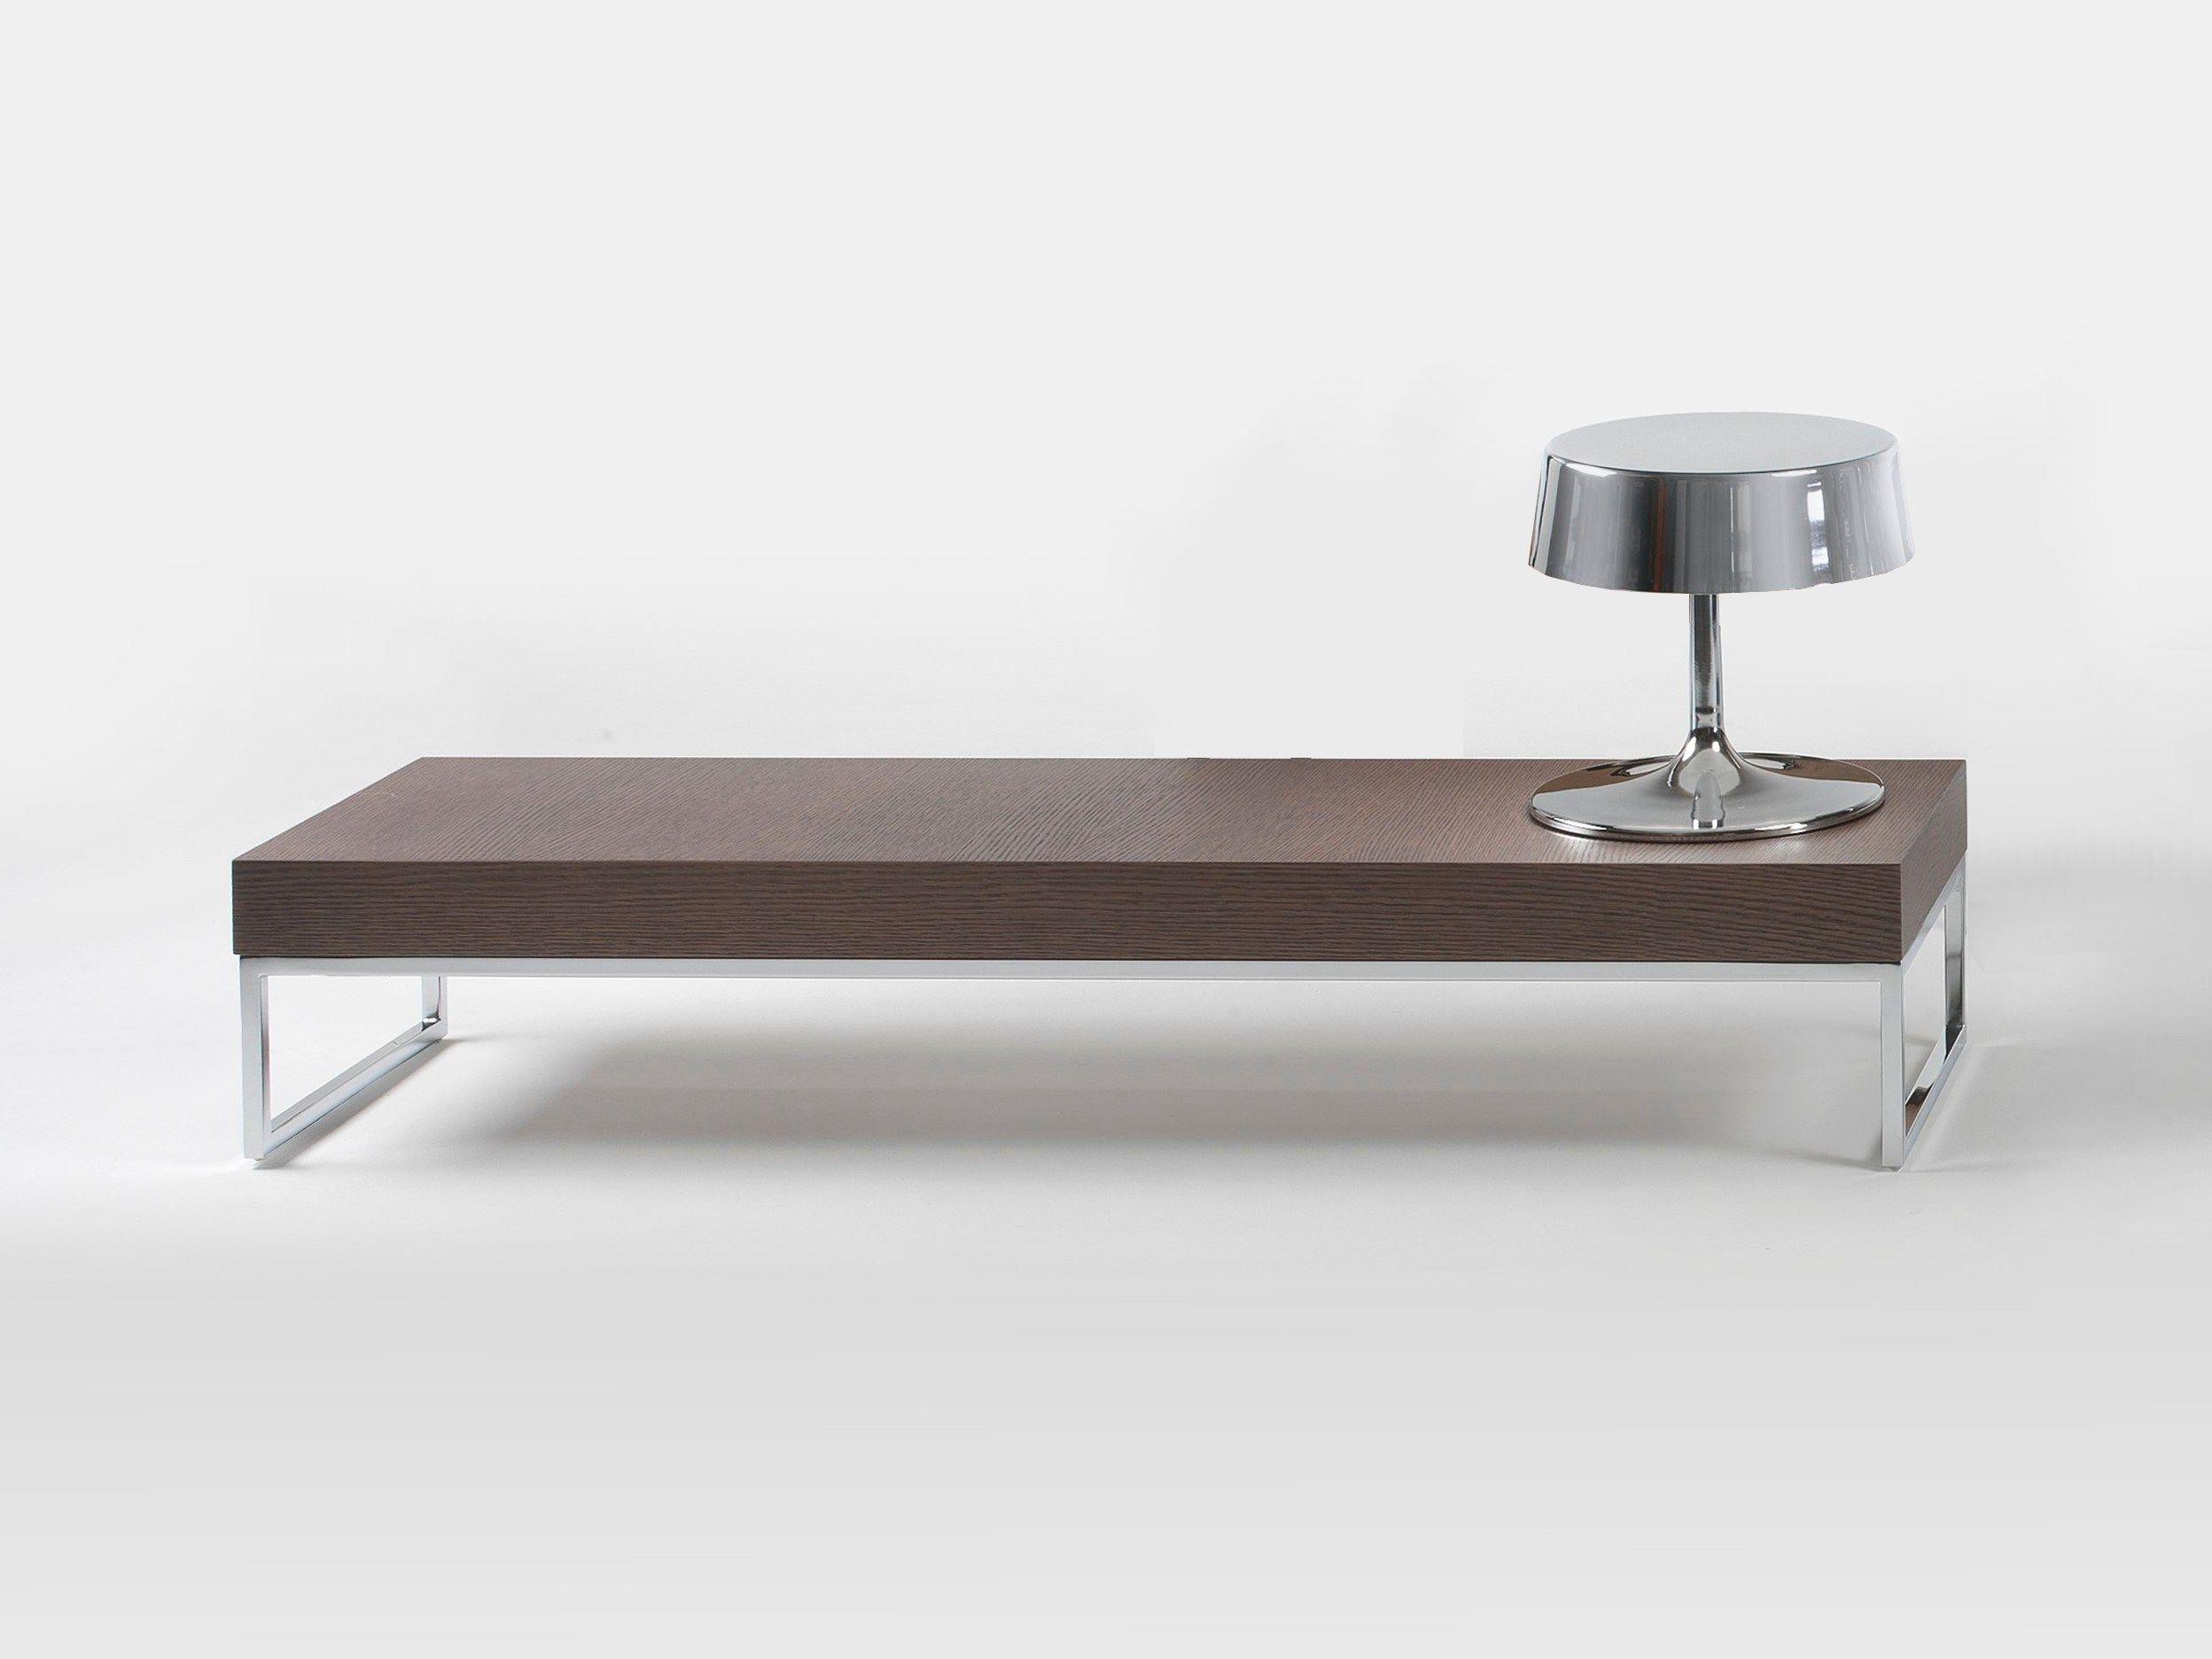 EGO Low coffee table by Giulio Marelli Italia design Studio crGM